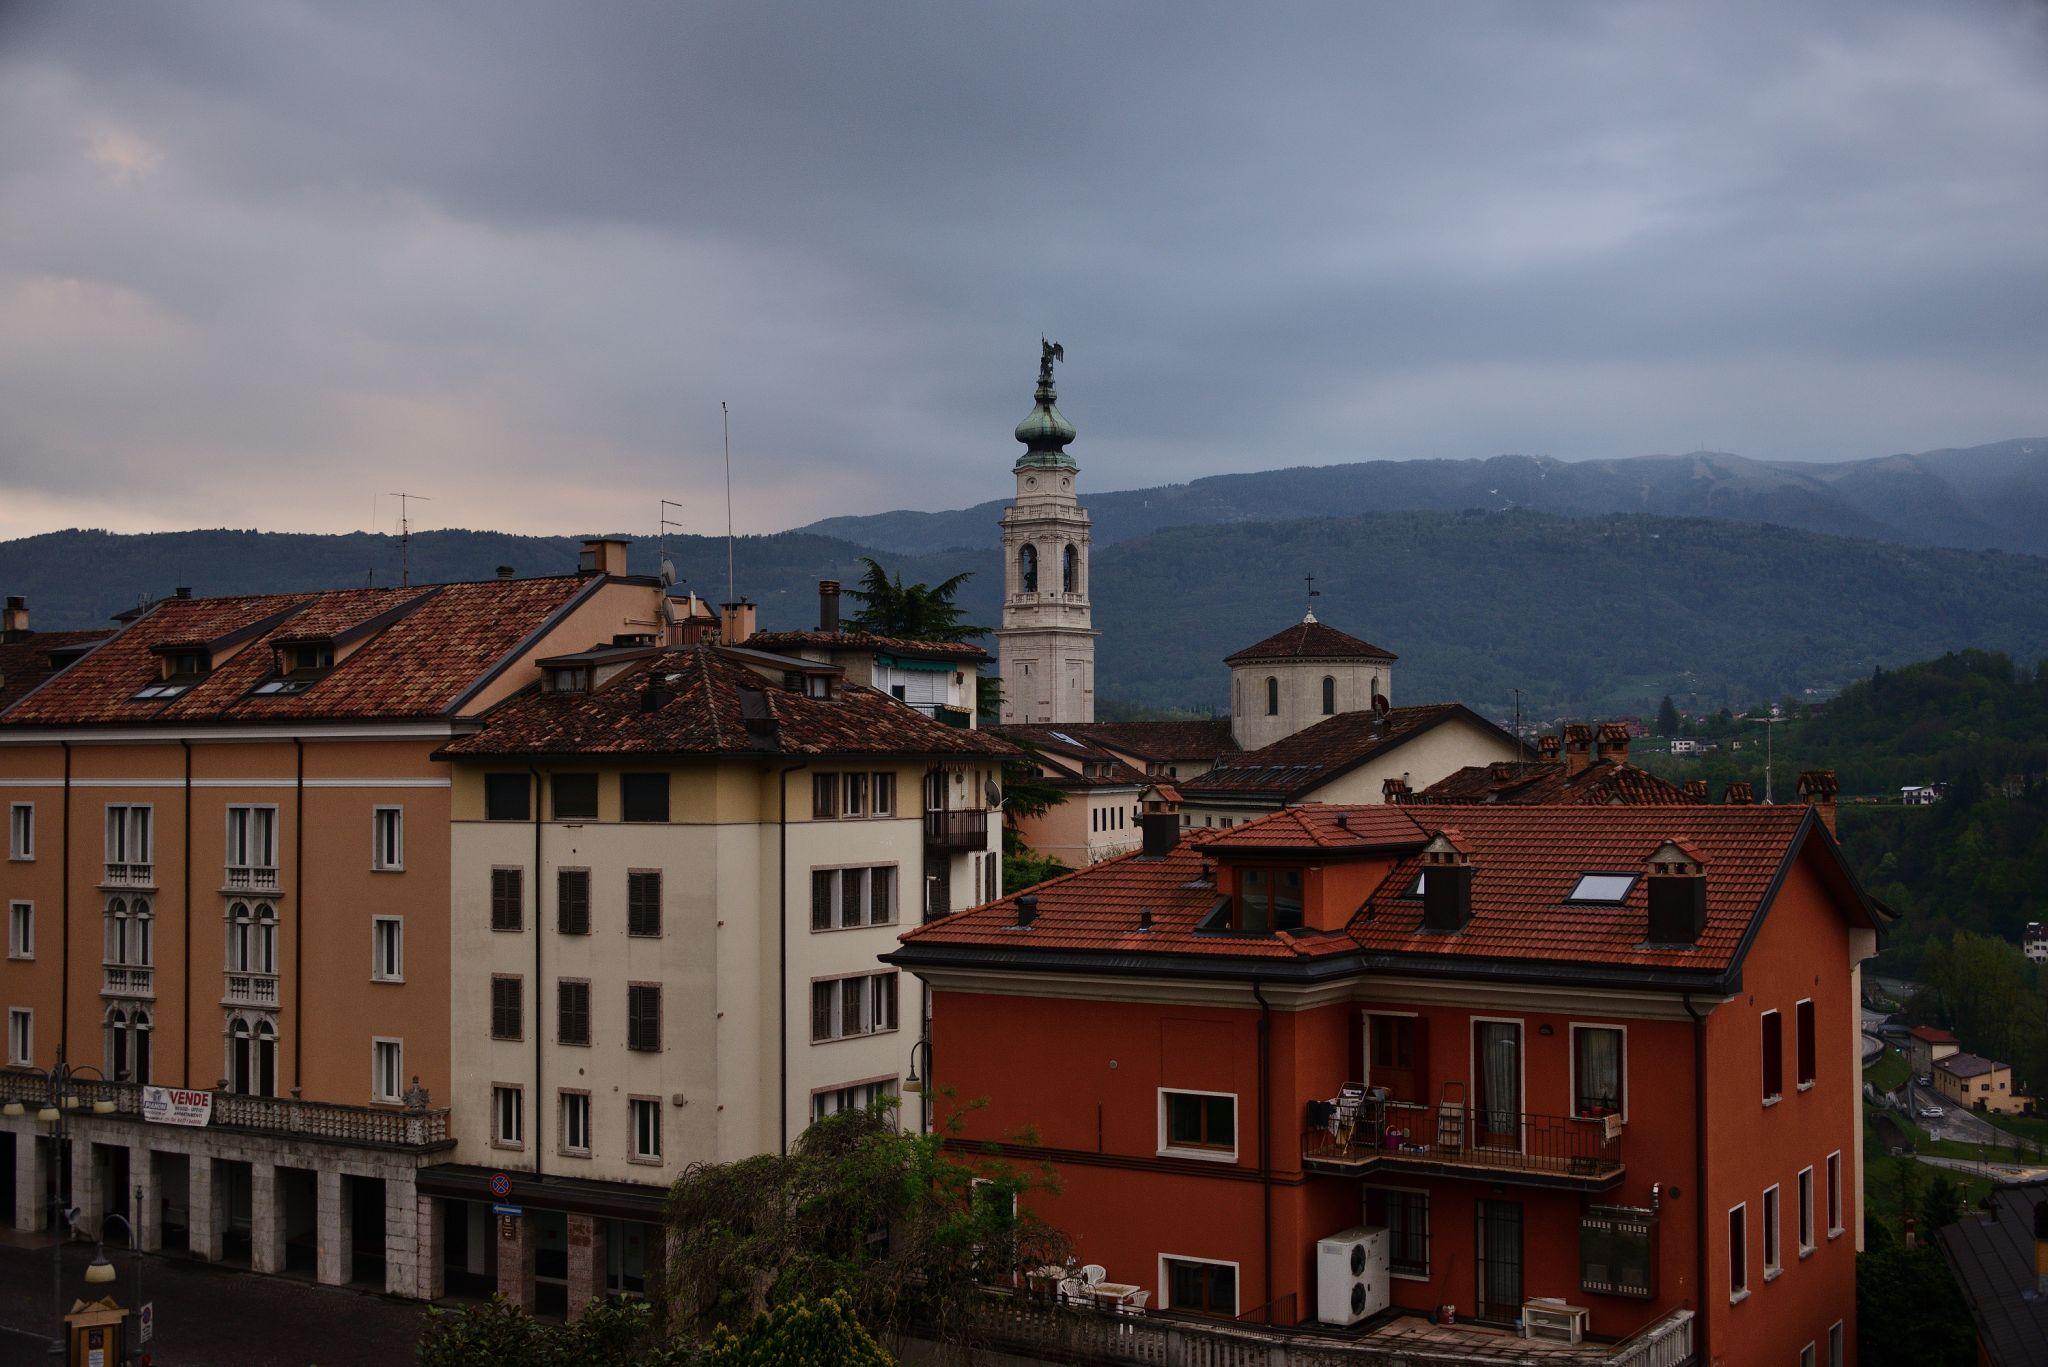 Belluno at daybreak, Italy